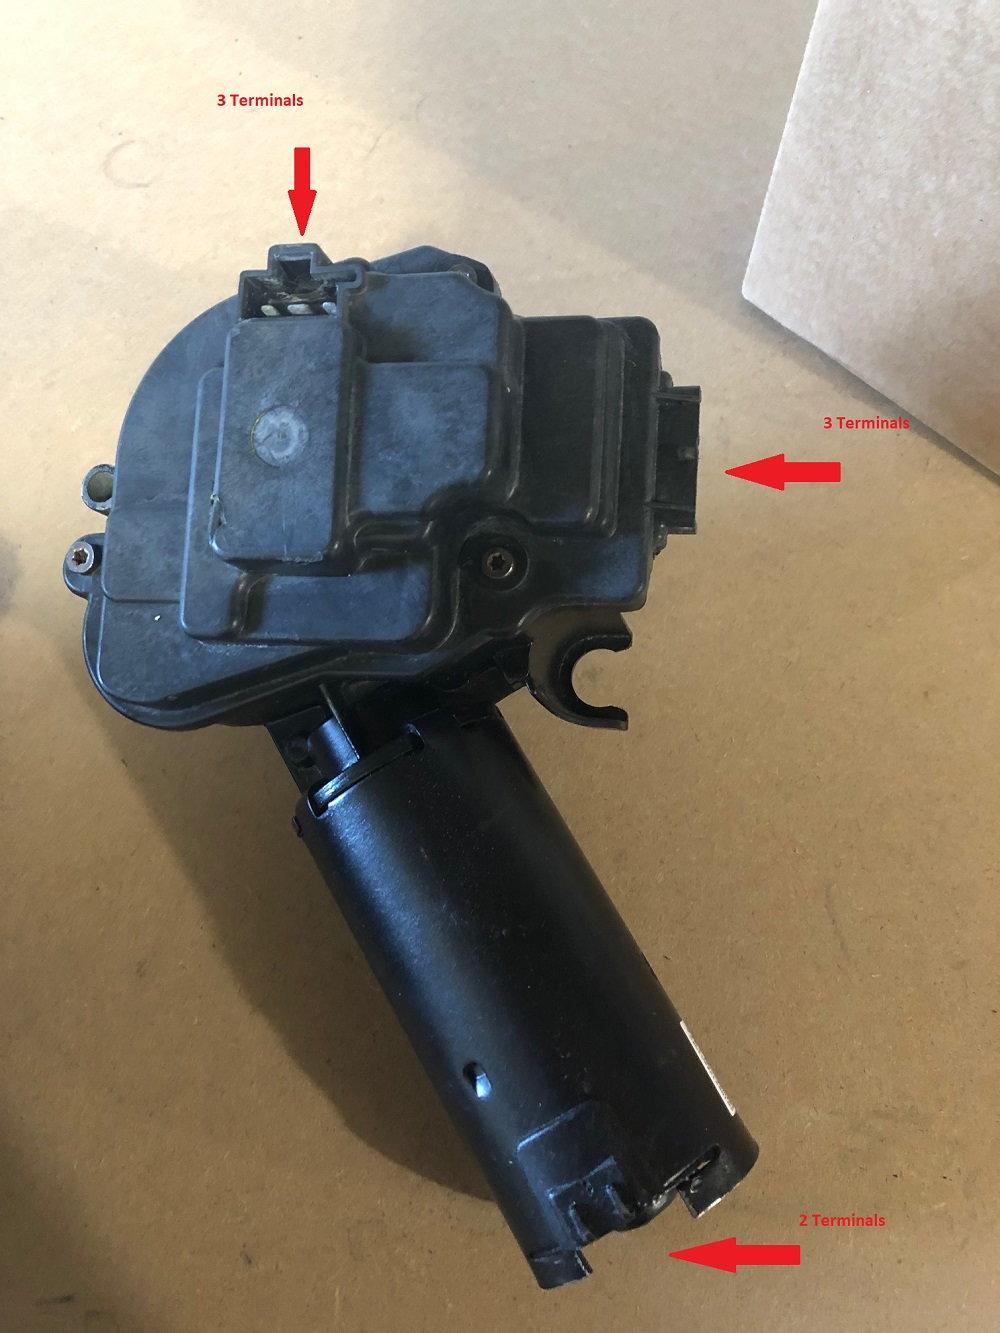 Need Help with Wiper Motor Wiring on '85 IROC - Camaro ...